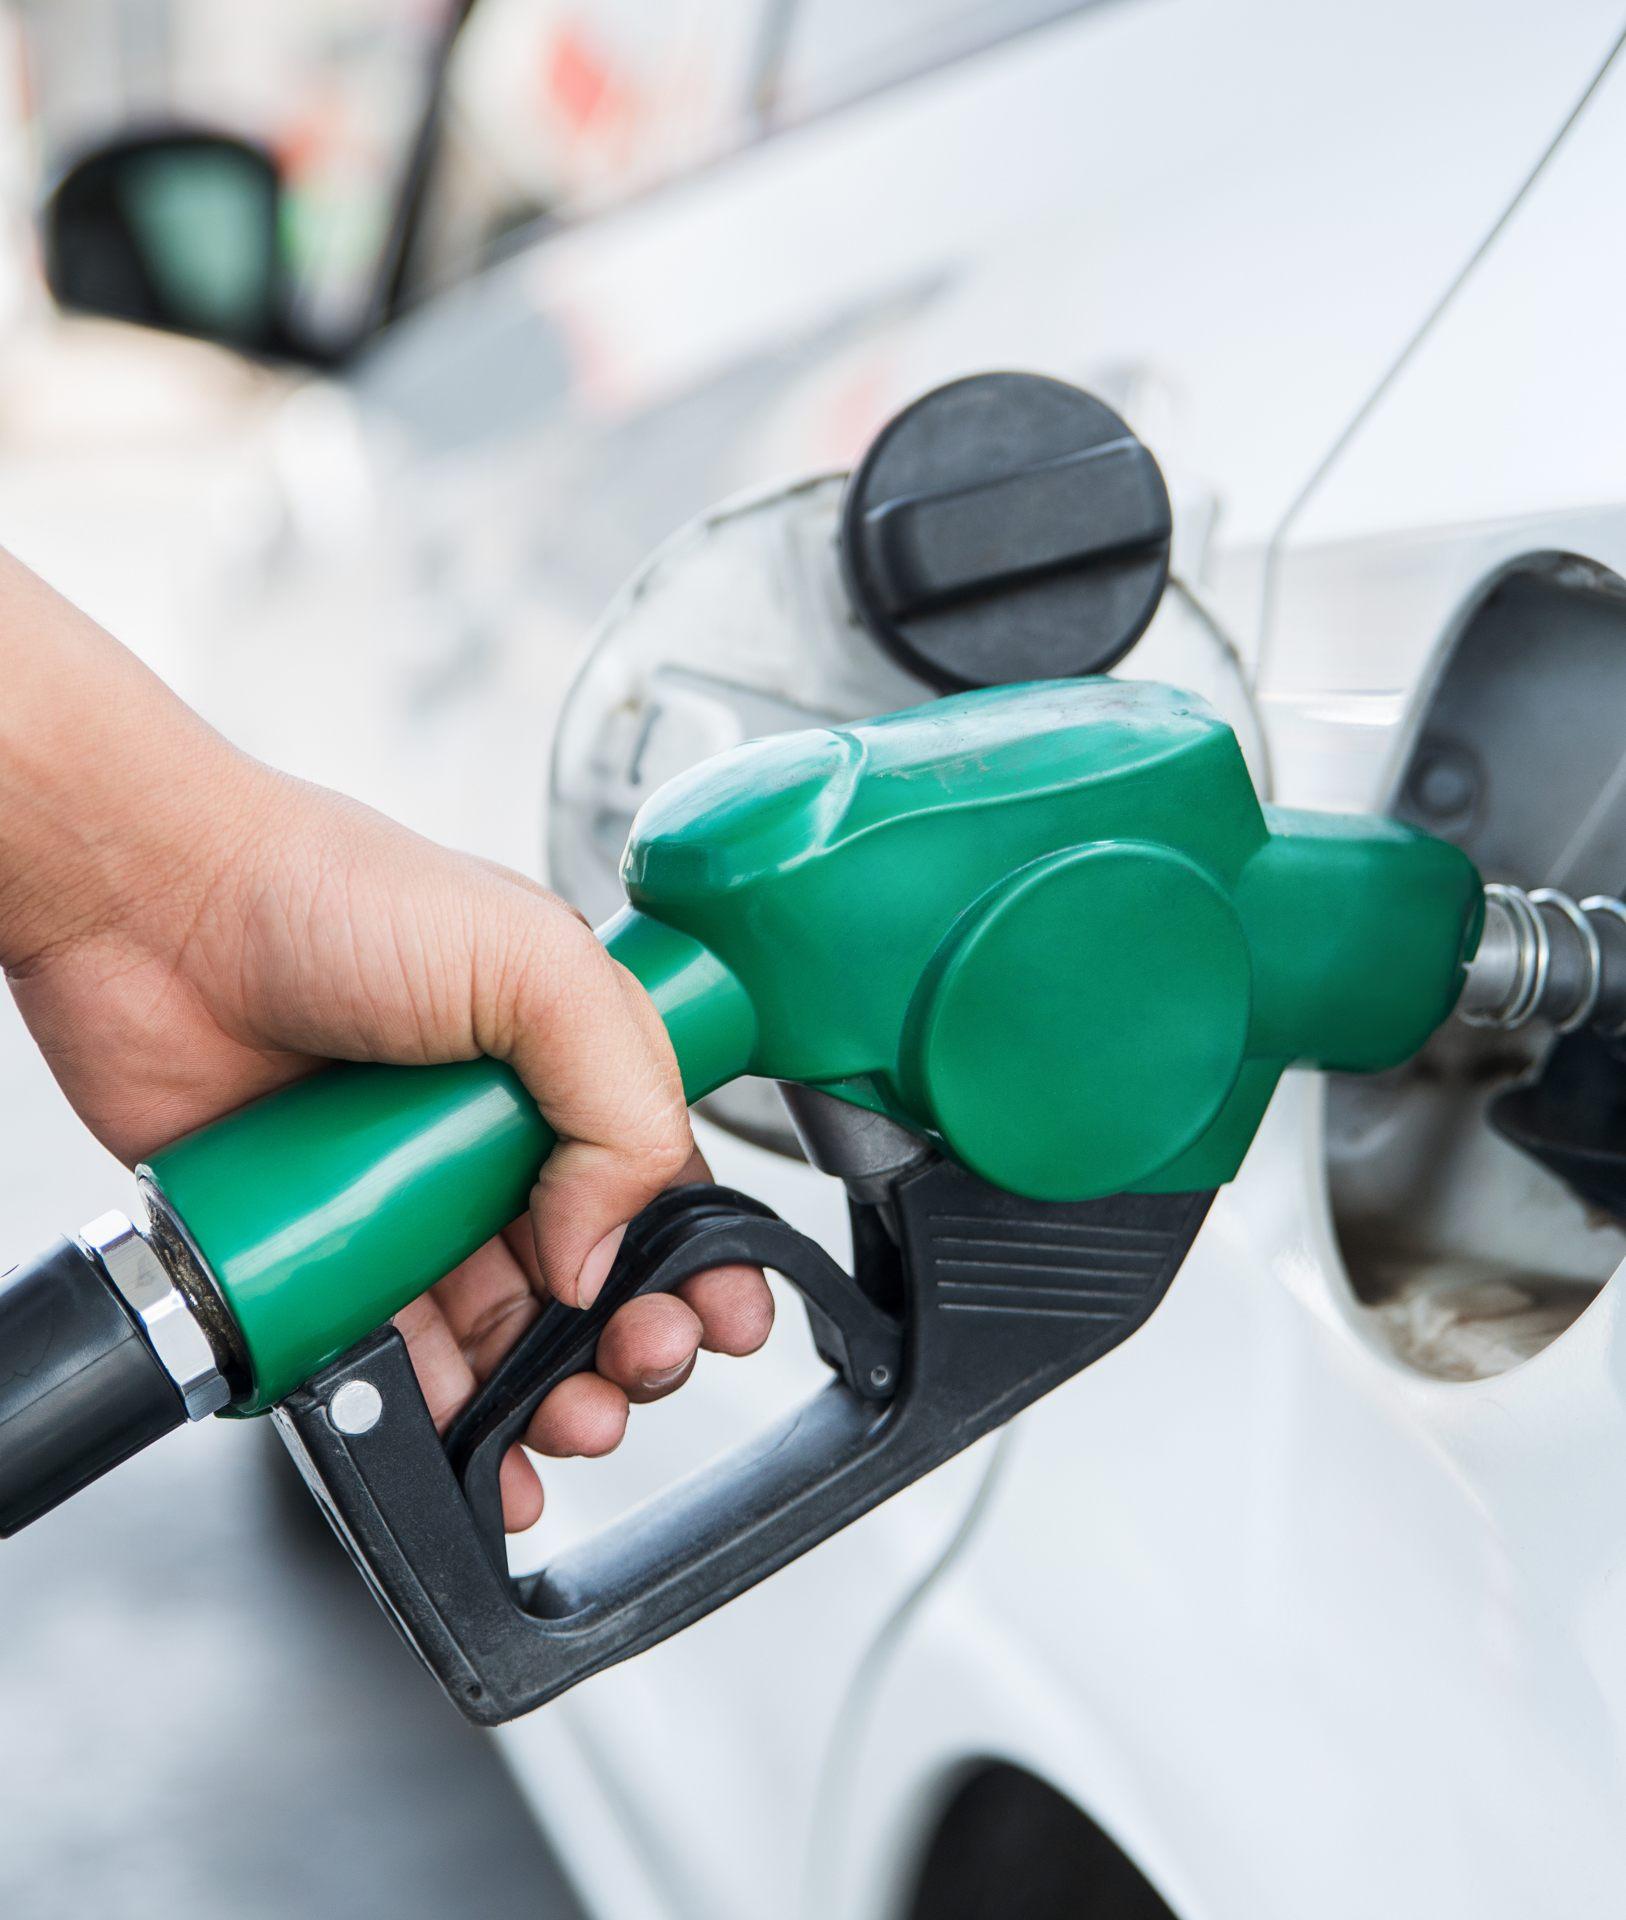 Adding fuel